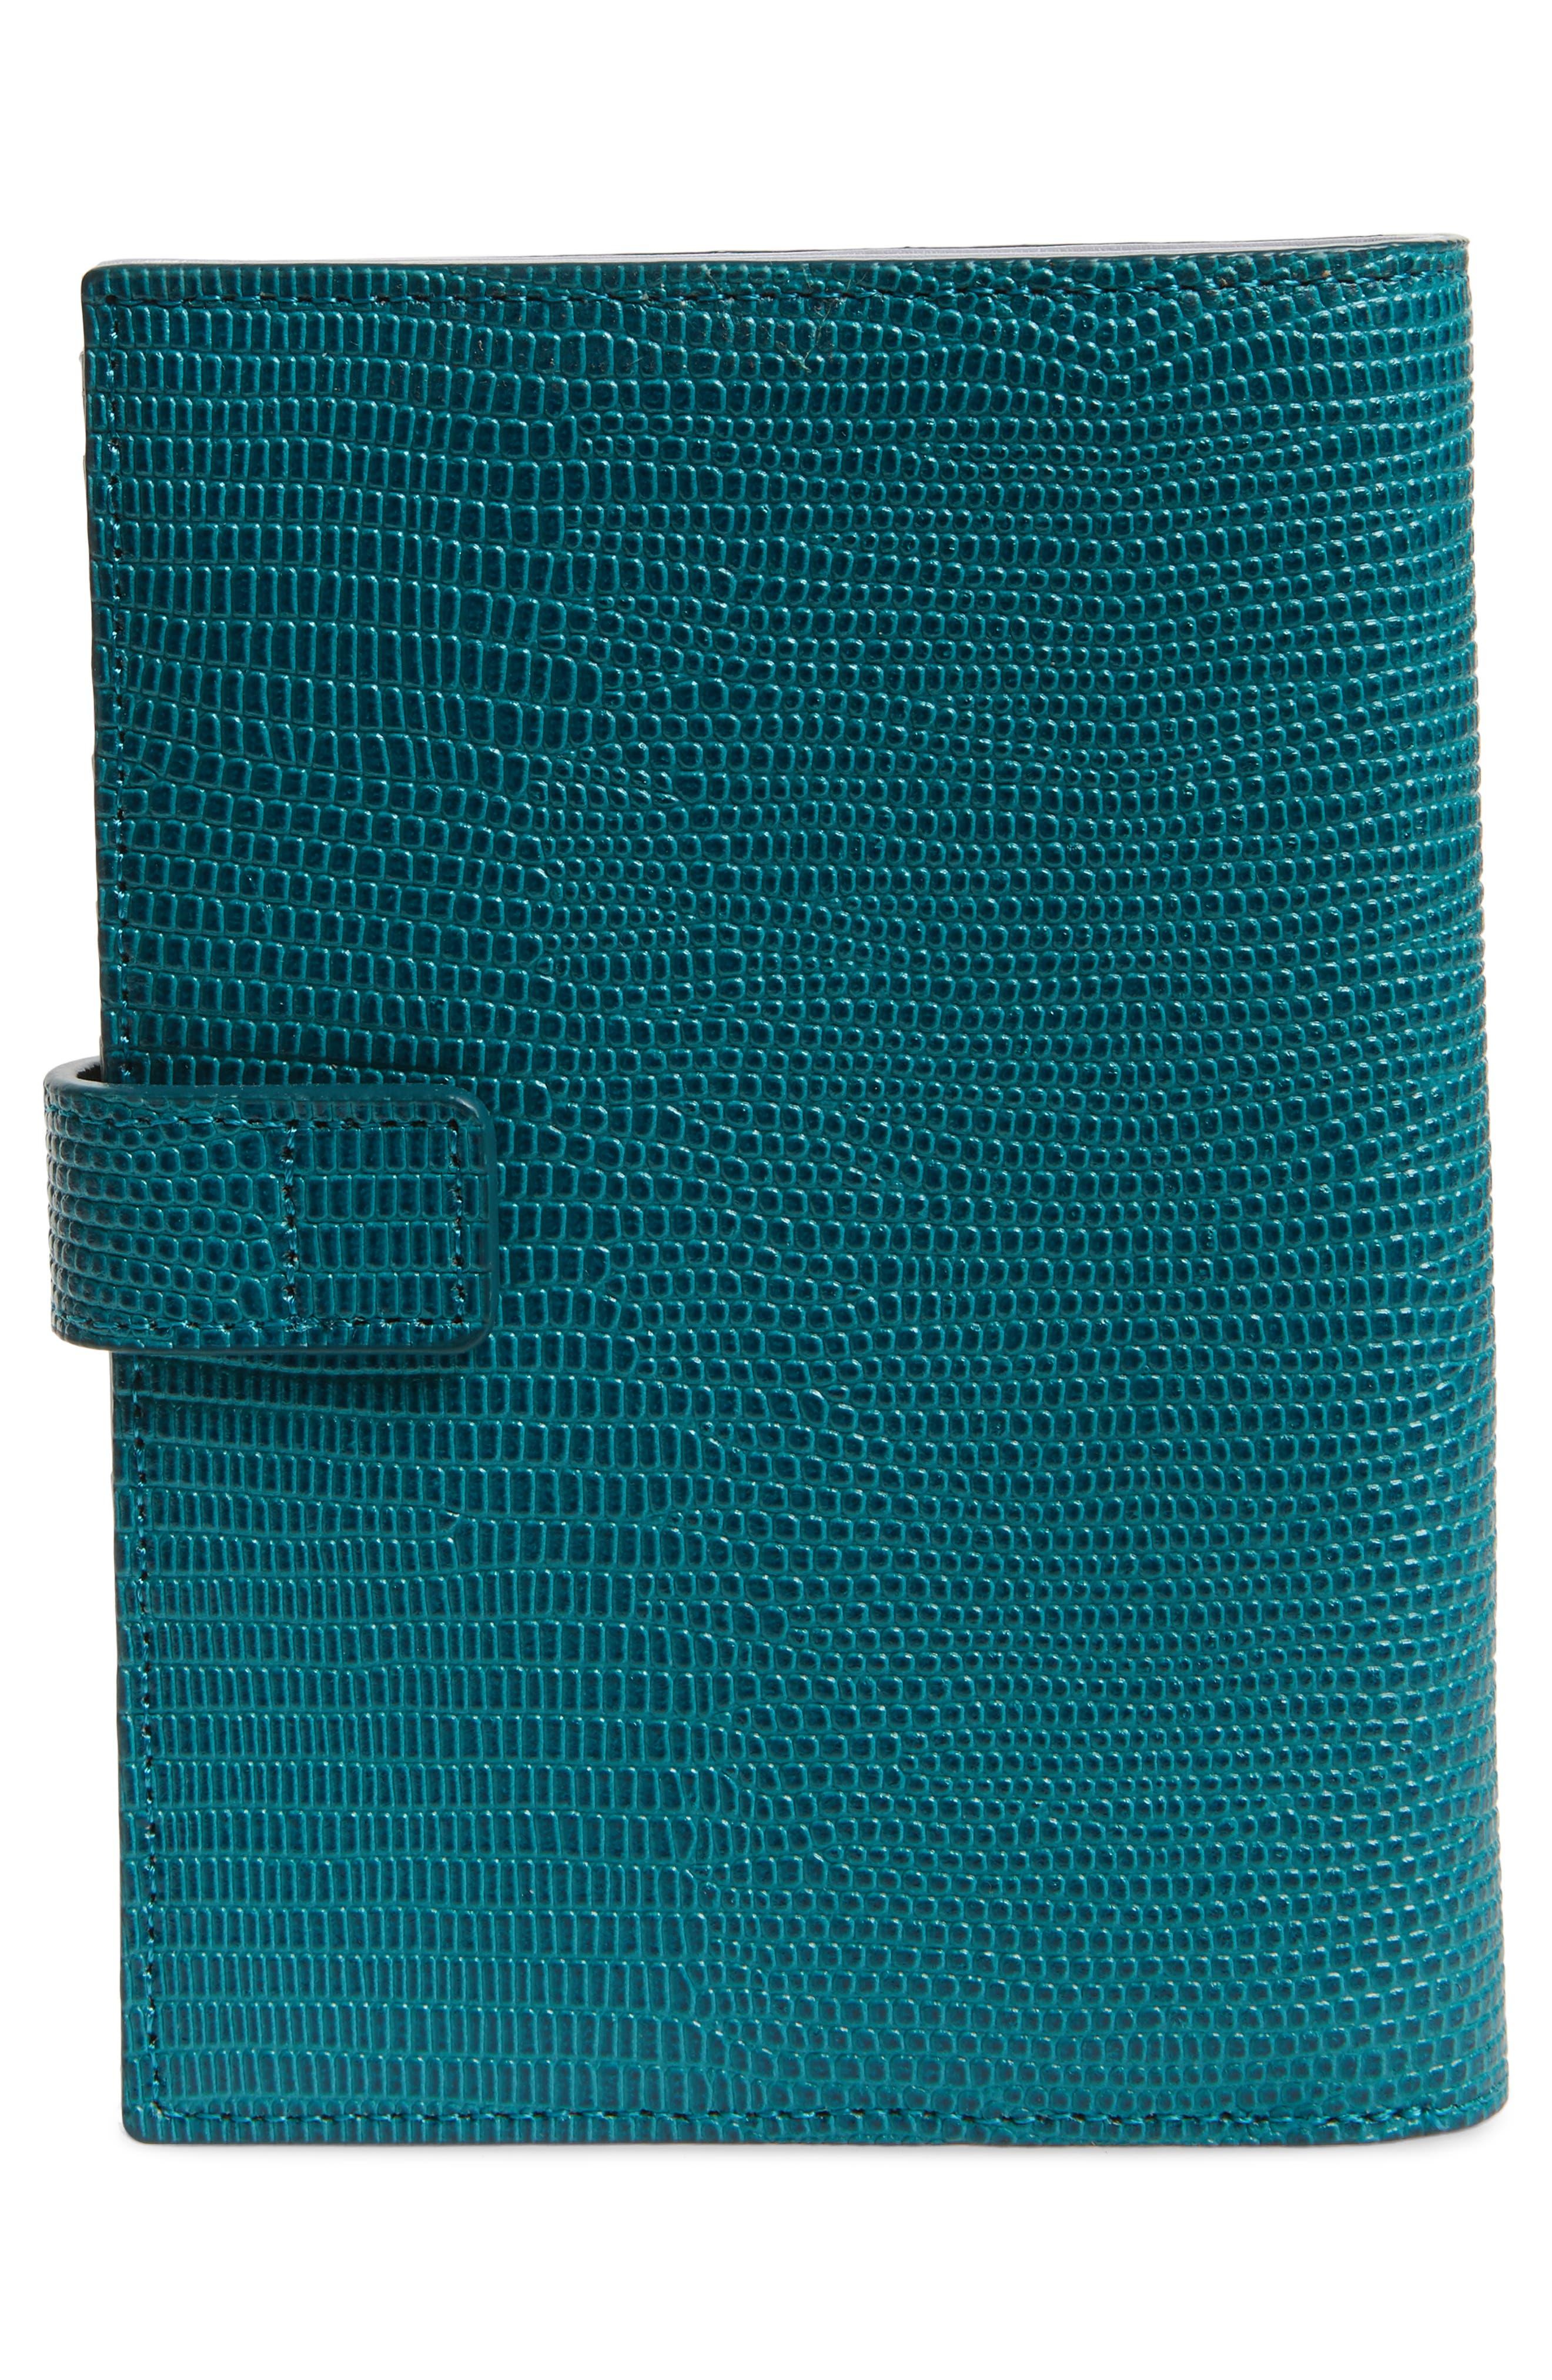 Lauren Lizard Embossed Leather Bifold Wallet,                             Alternate thumbnail 4, color,                             TEAL HARBOR